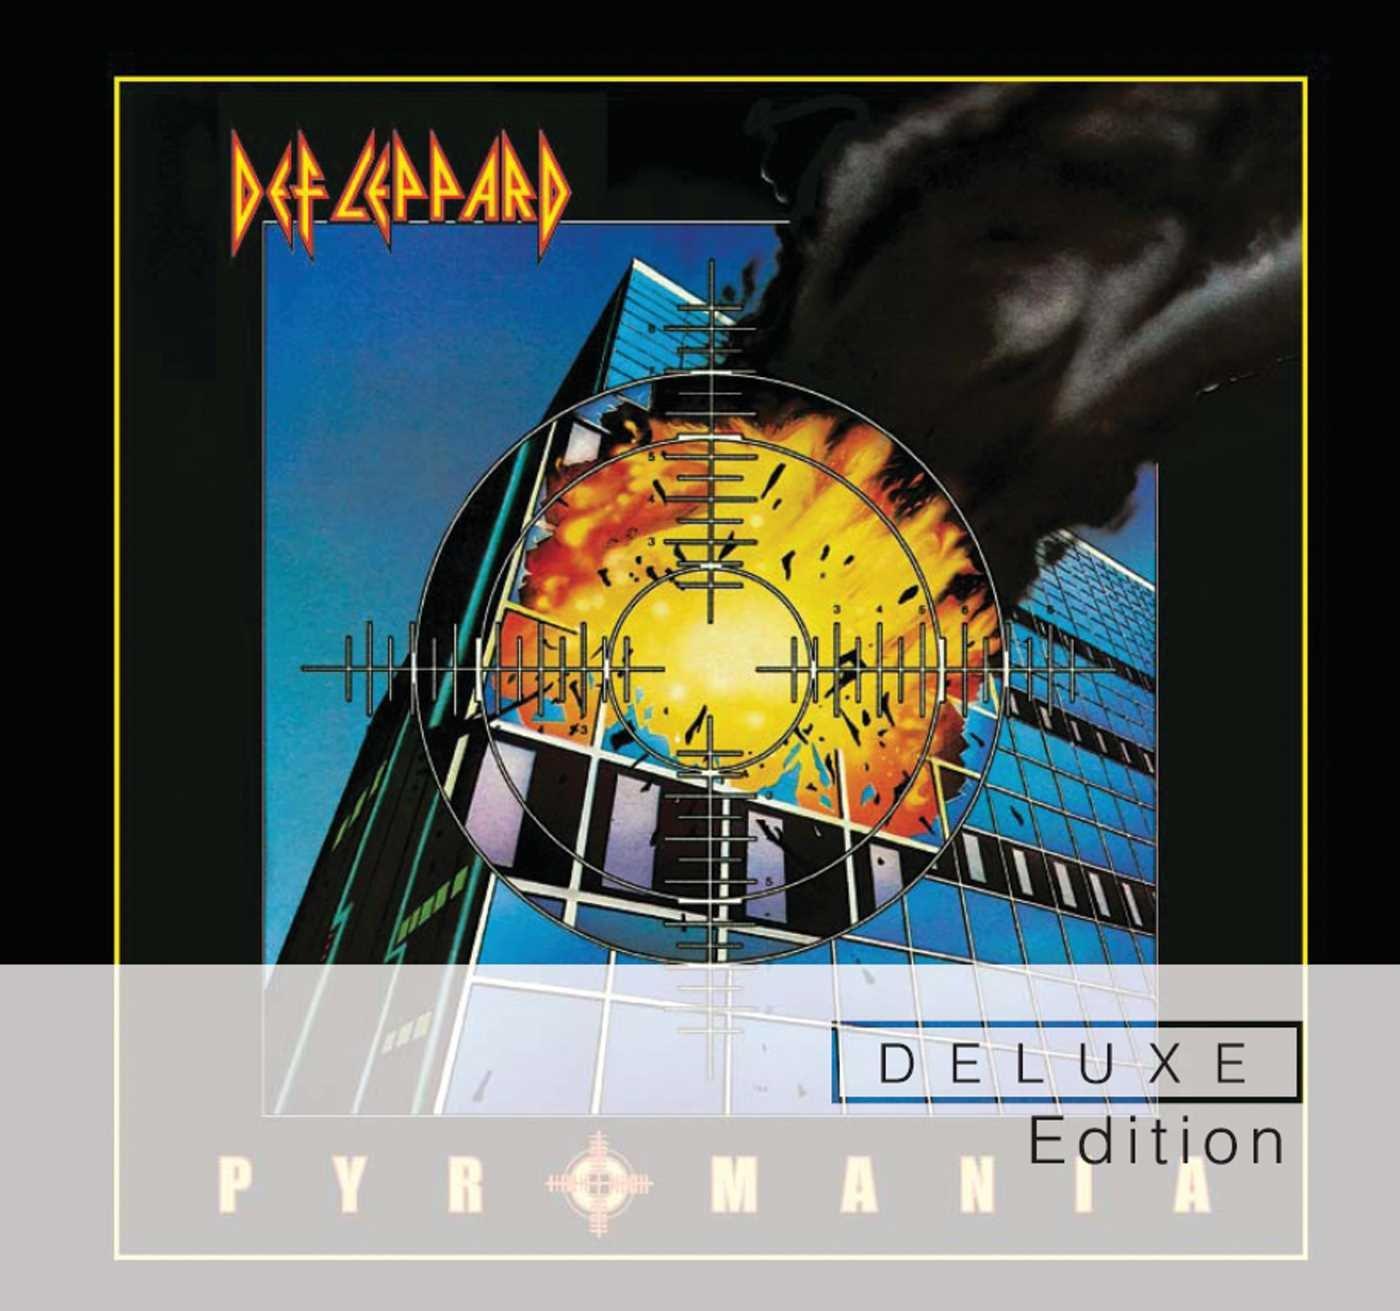 Pyromania [Deluxe Edition] by Mercury